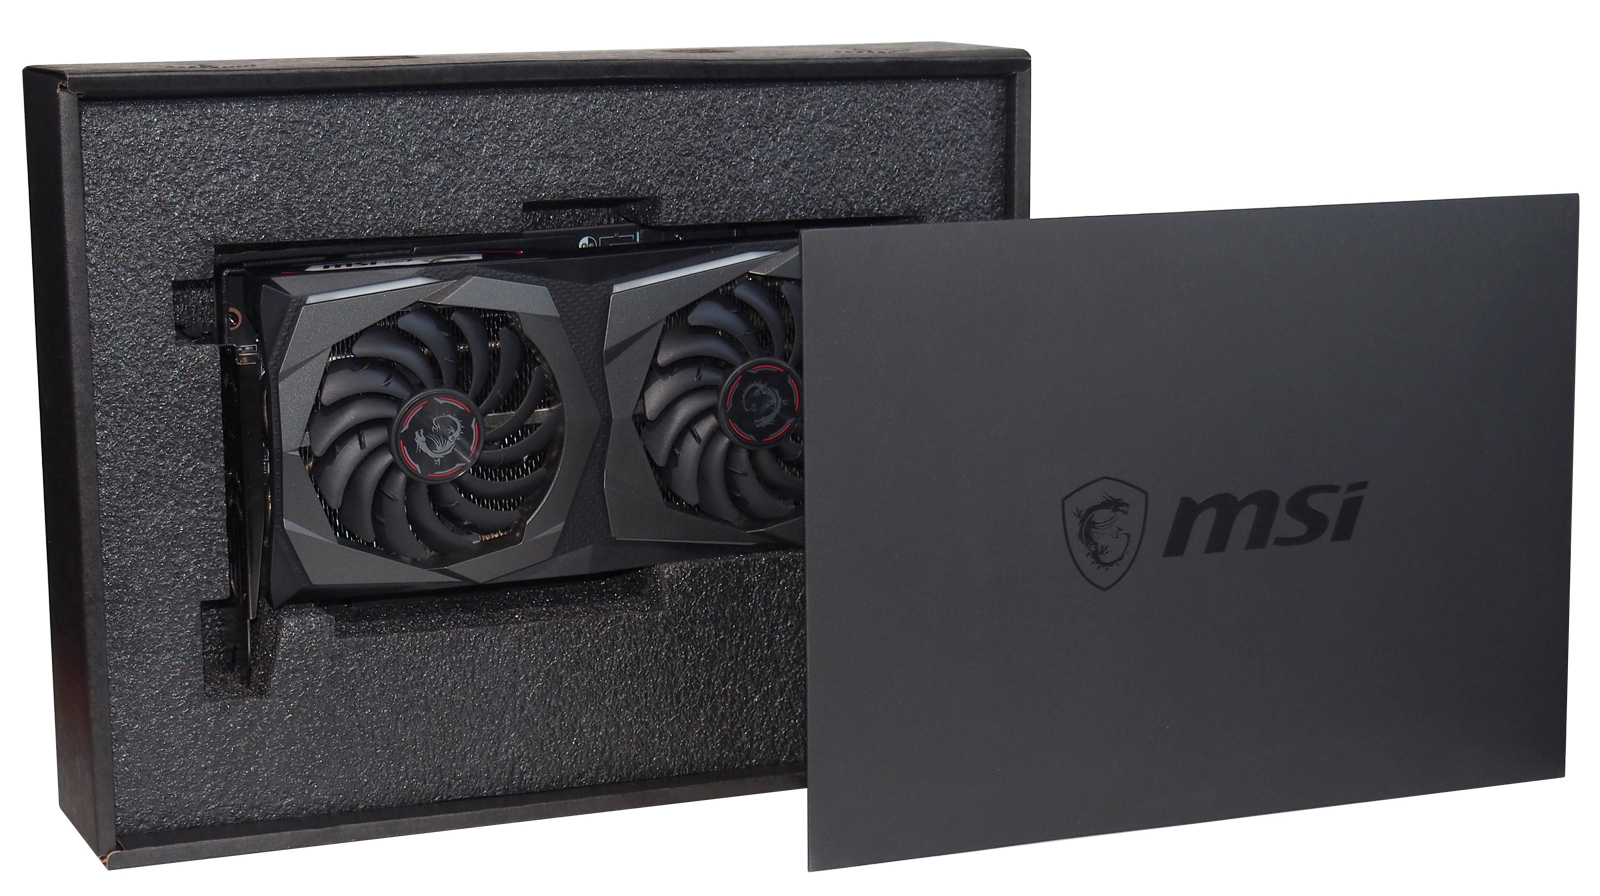 Обзор и тест видеокарты MSI GeForce RTX 2060 Gaming Z 6G — i2HARD